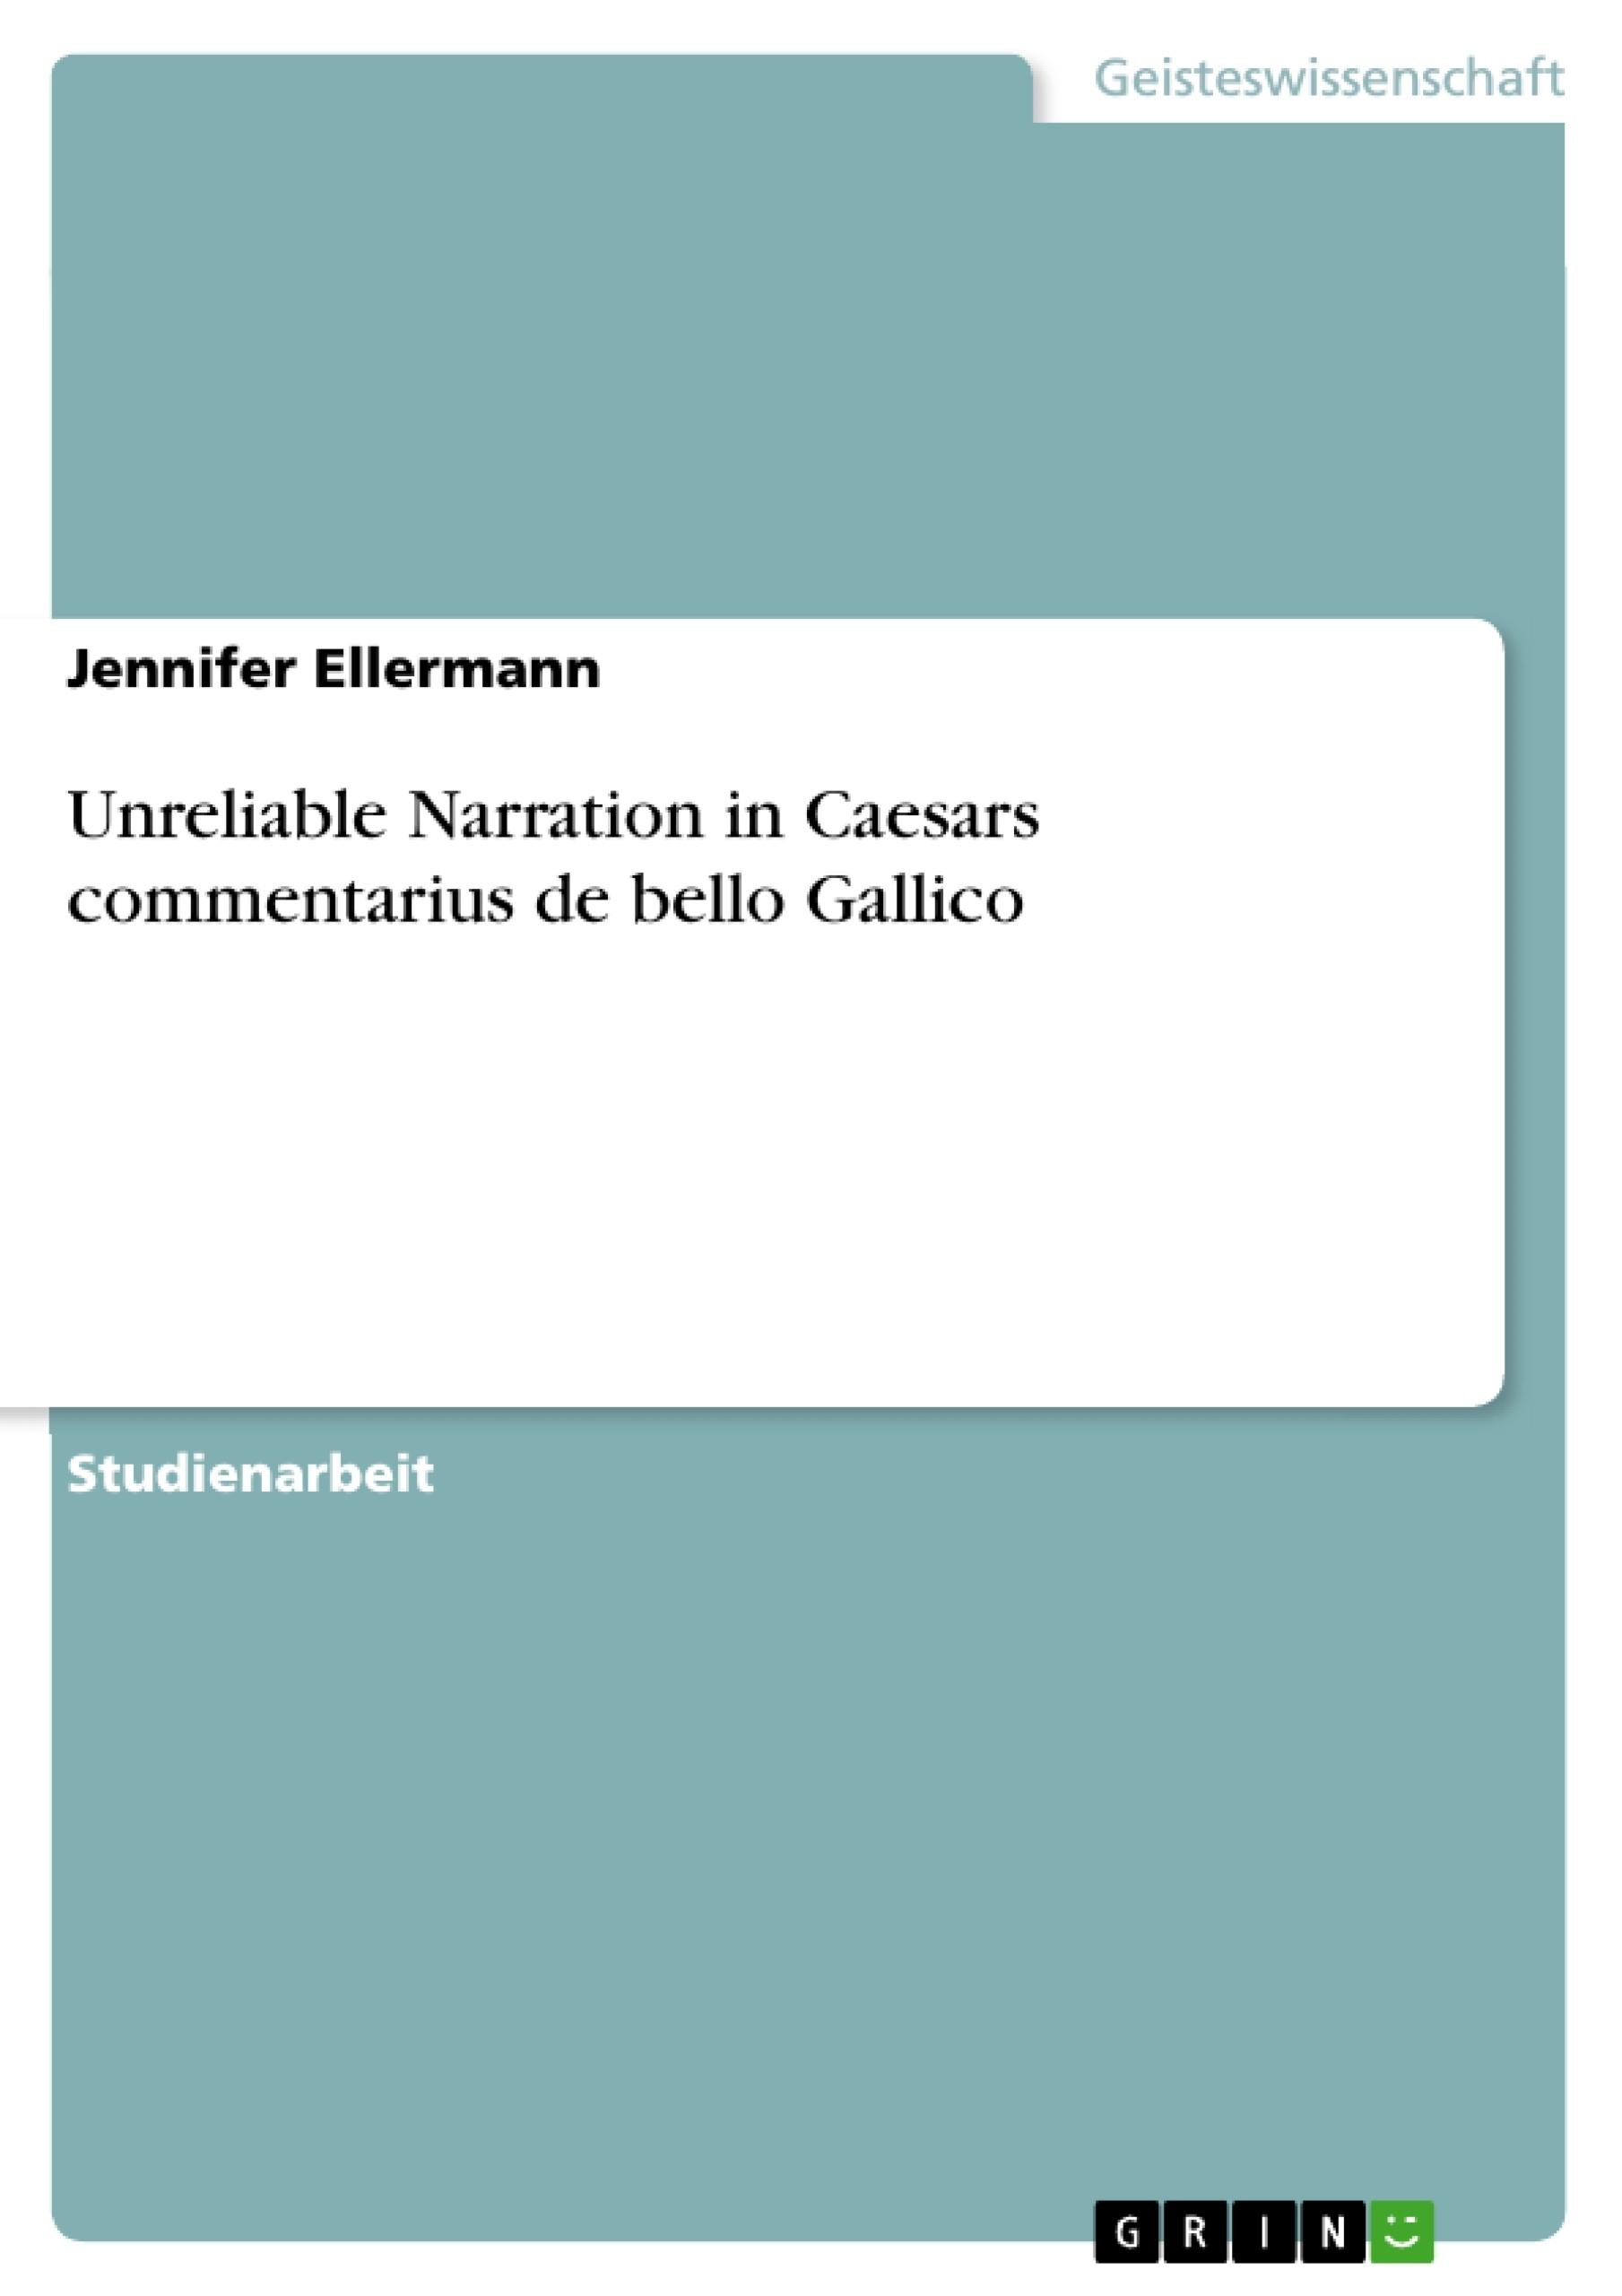 Titel: Unreliable Narration in Caesars commentarius de bello Gallico